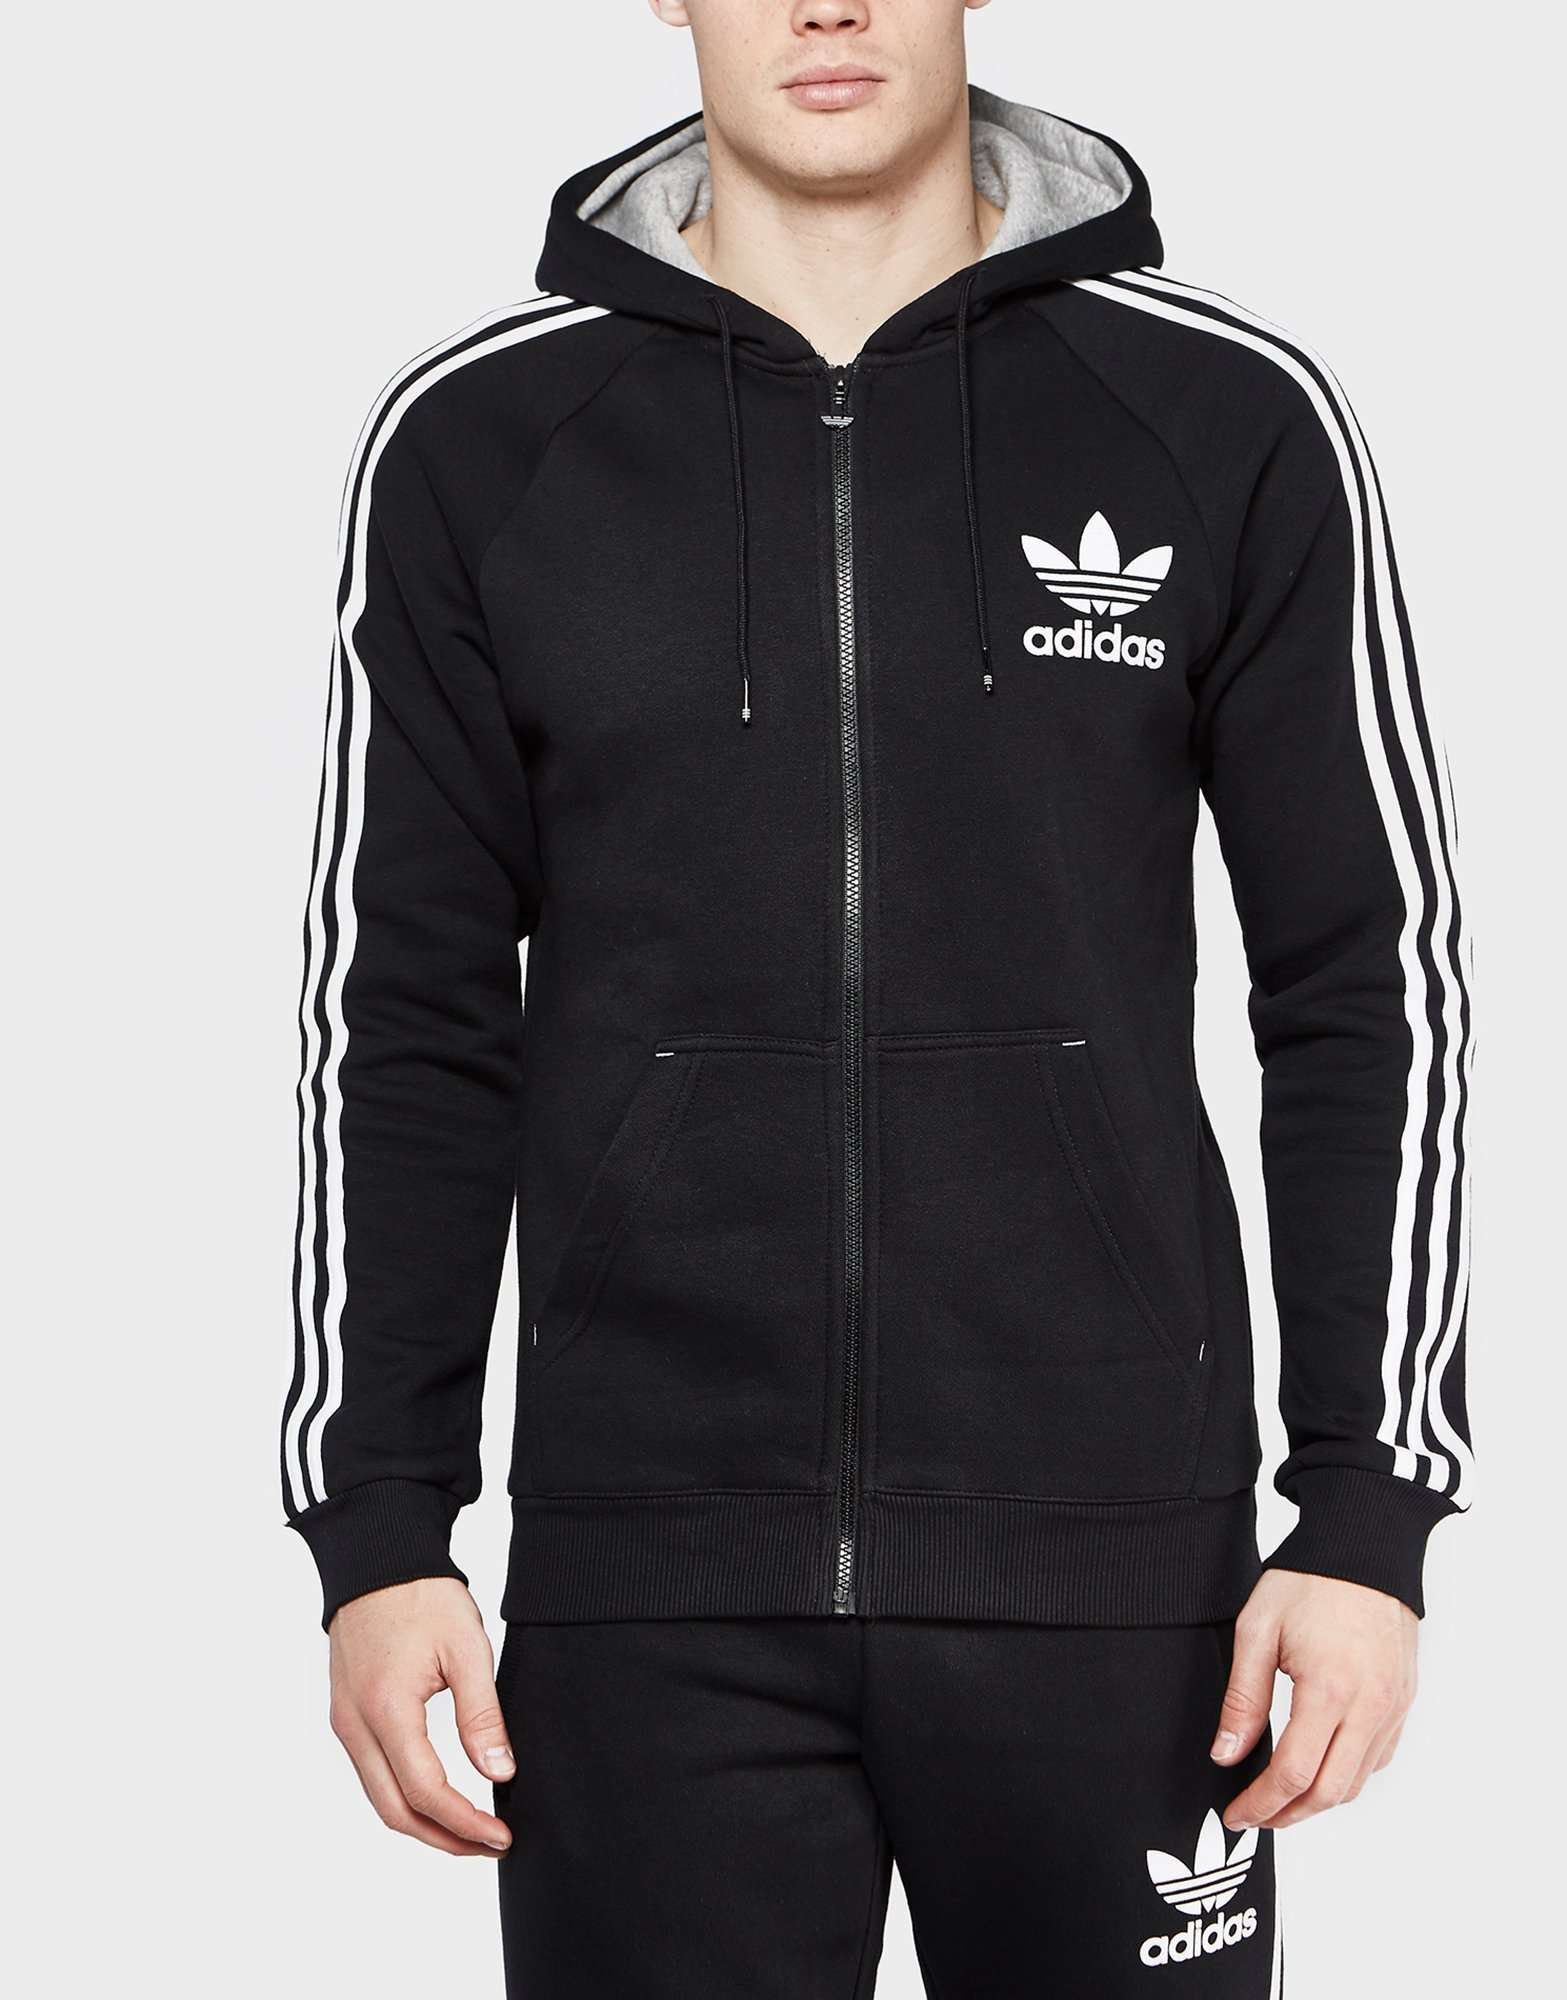 California HoodieScotts Zip Adidas Menswear Originals Full wO8Xn0Pk